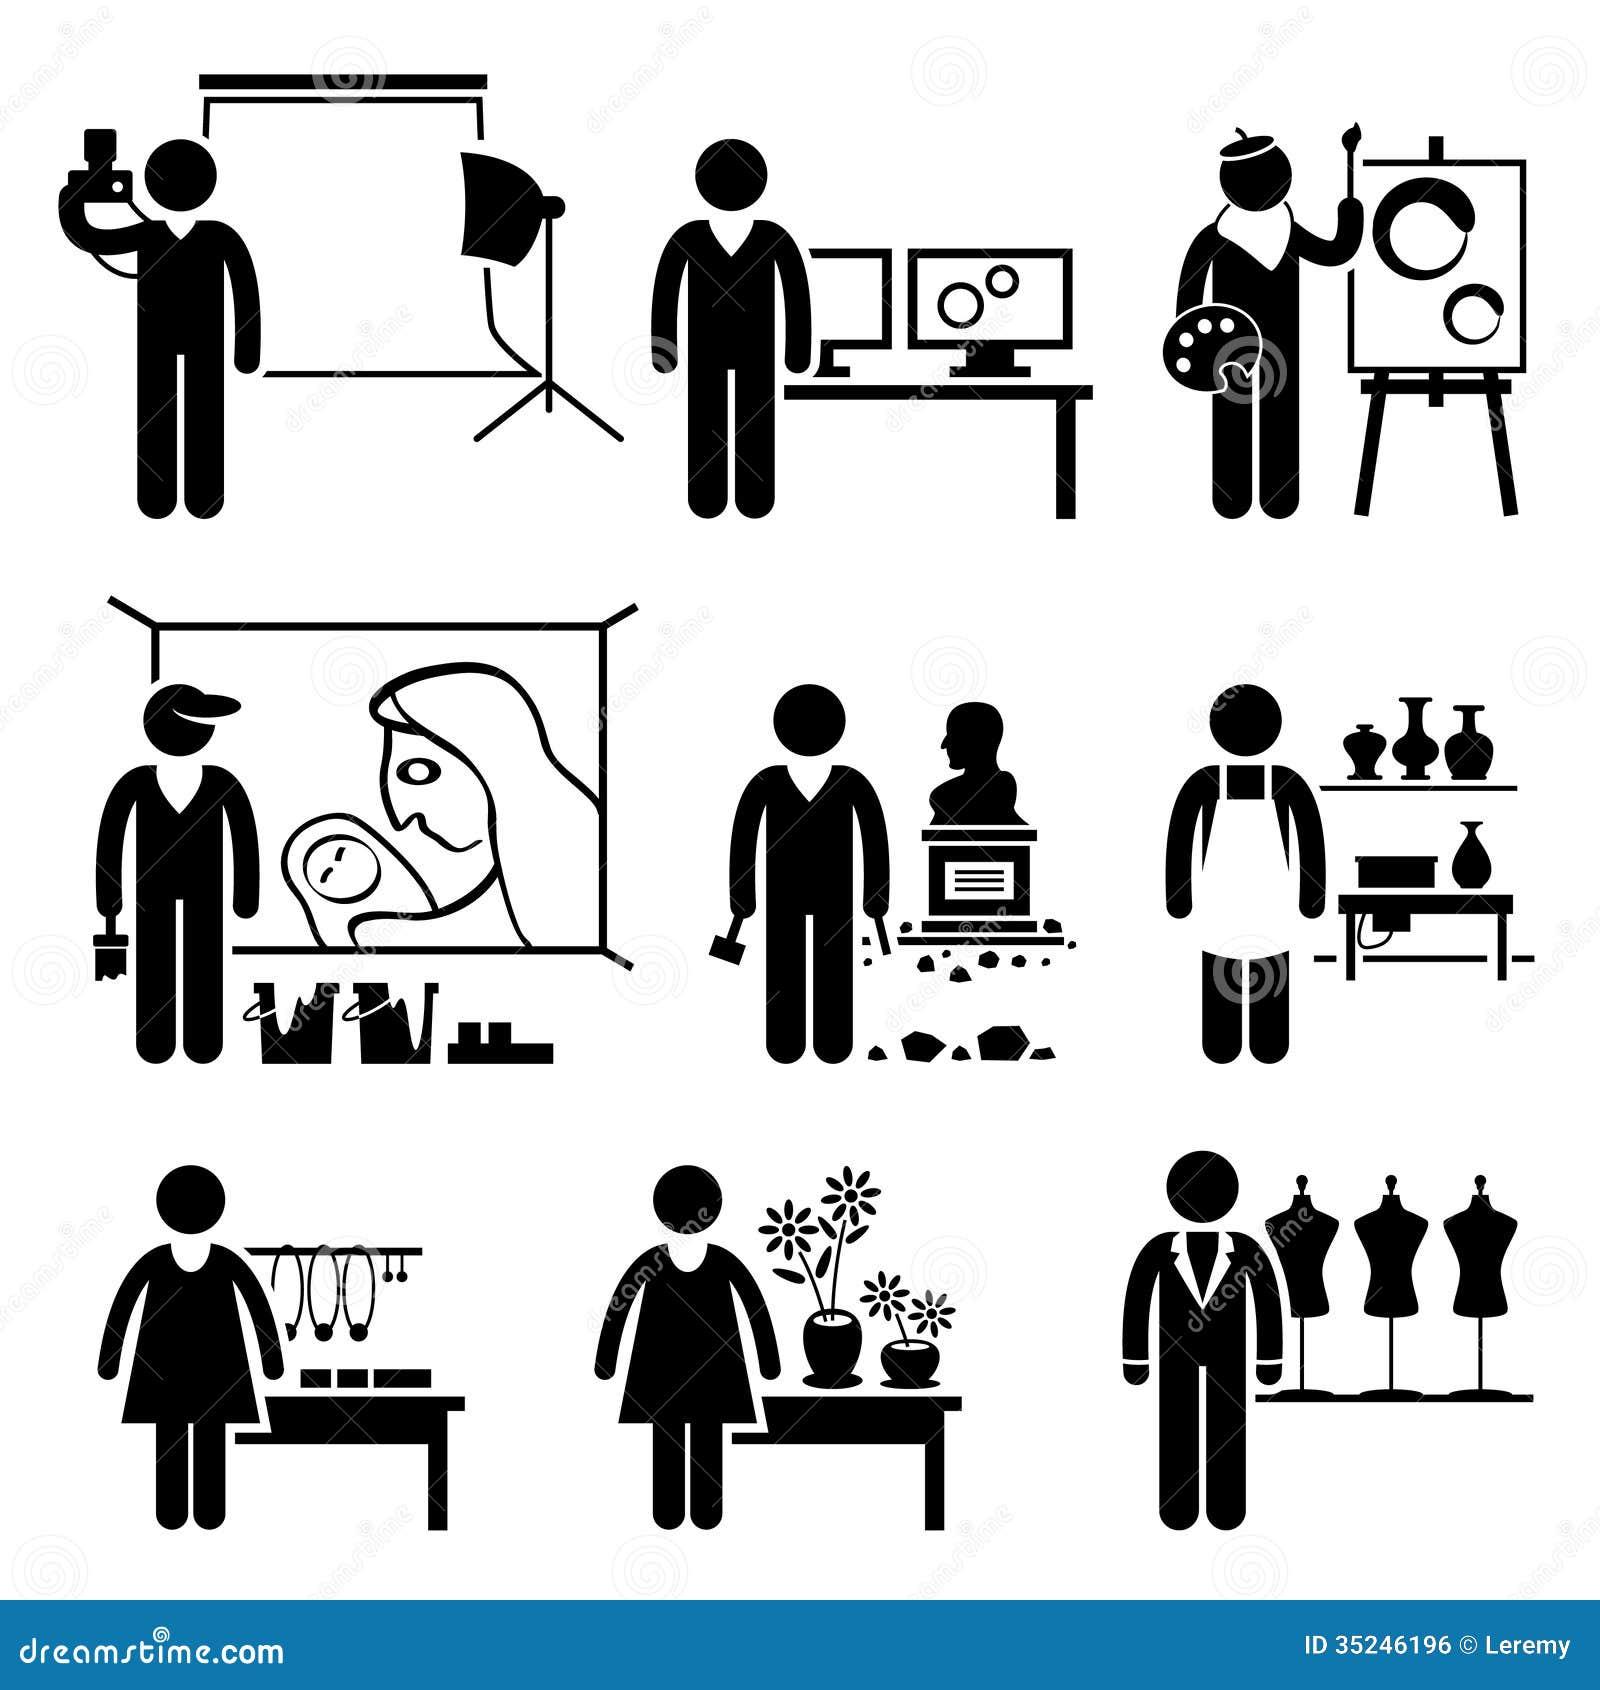 Careers: Artistic Designer Jobs Occupations Careers Stock Vector